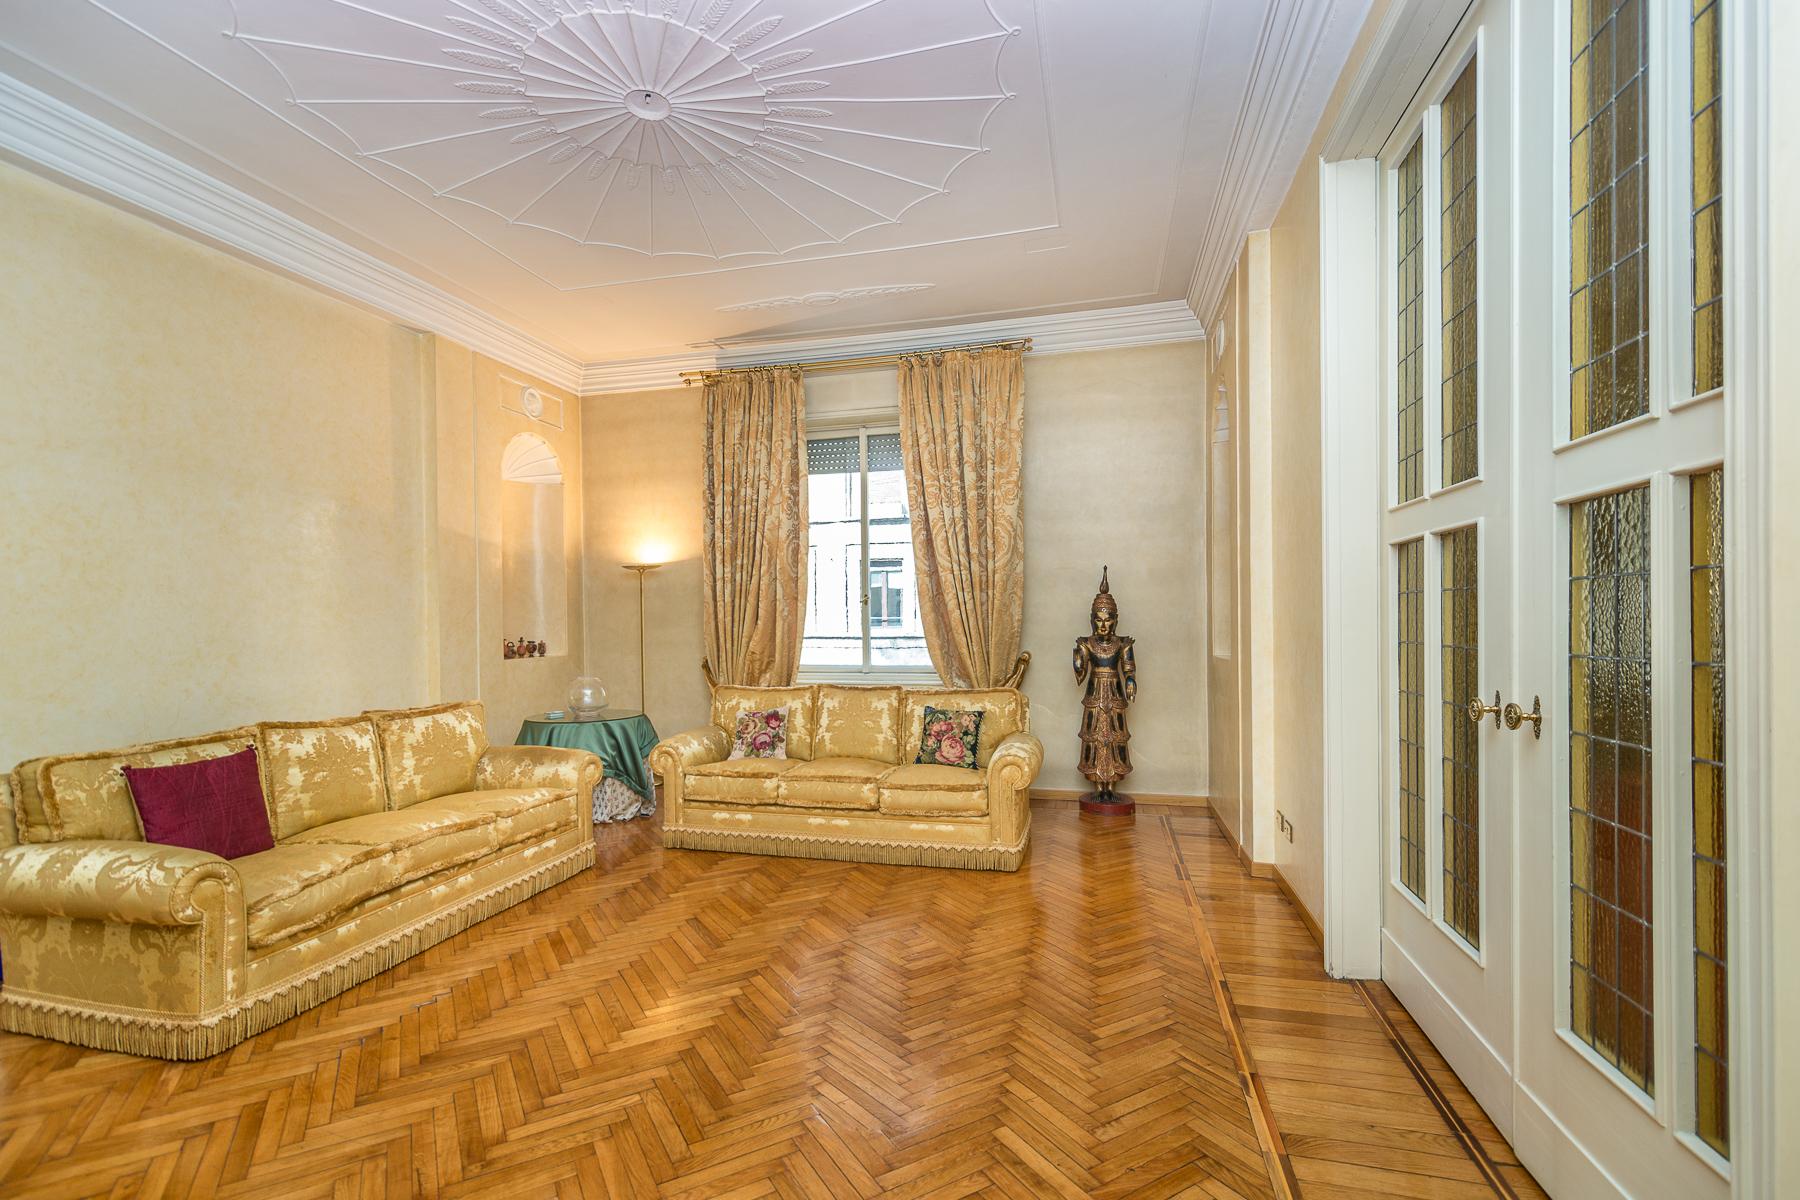 Apartment for Sale at Charming apartament in prestigious building Via Appiani Milano, Milan, 20121 Italy